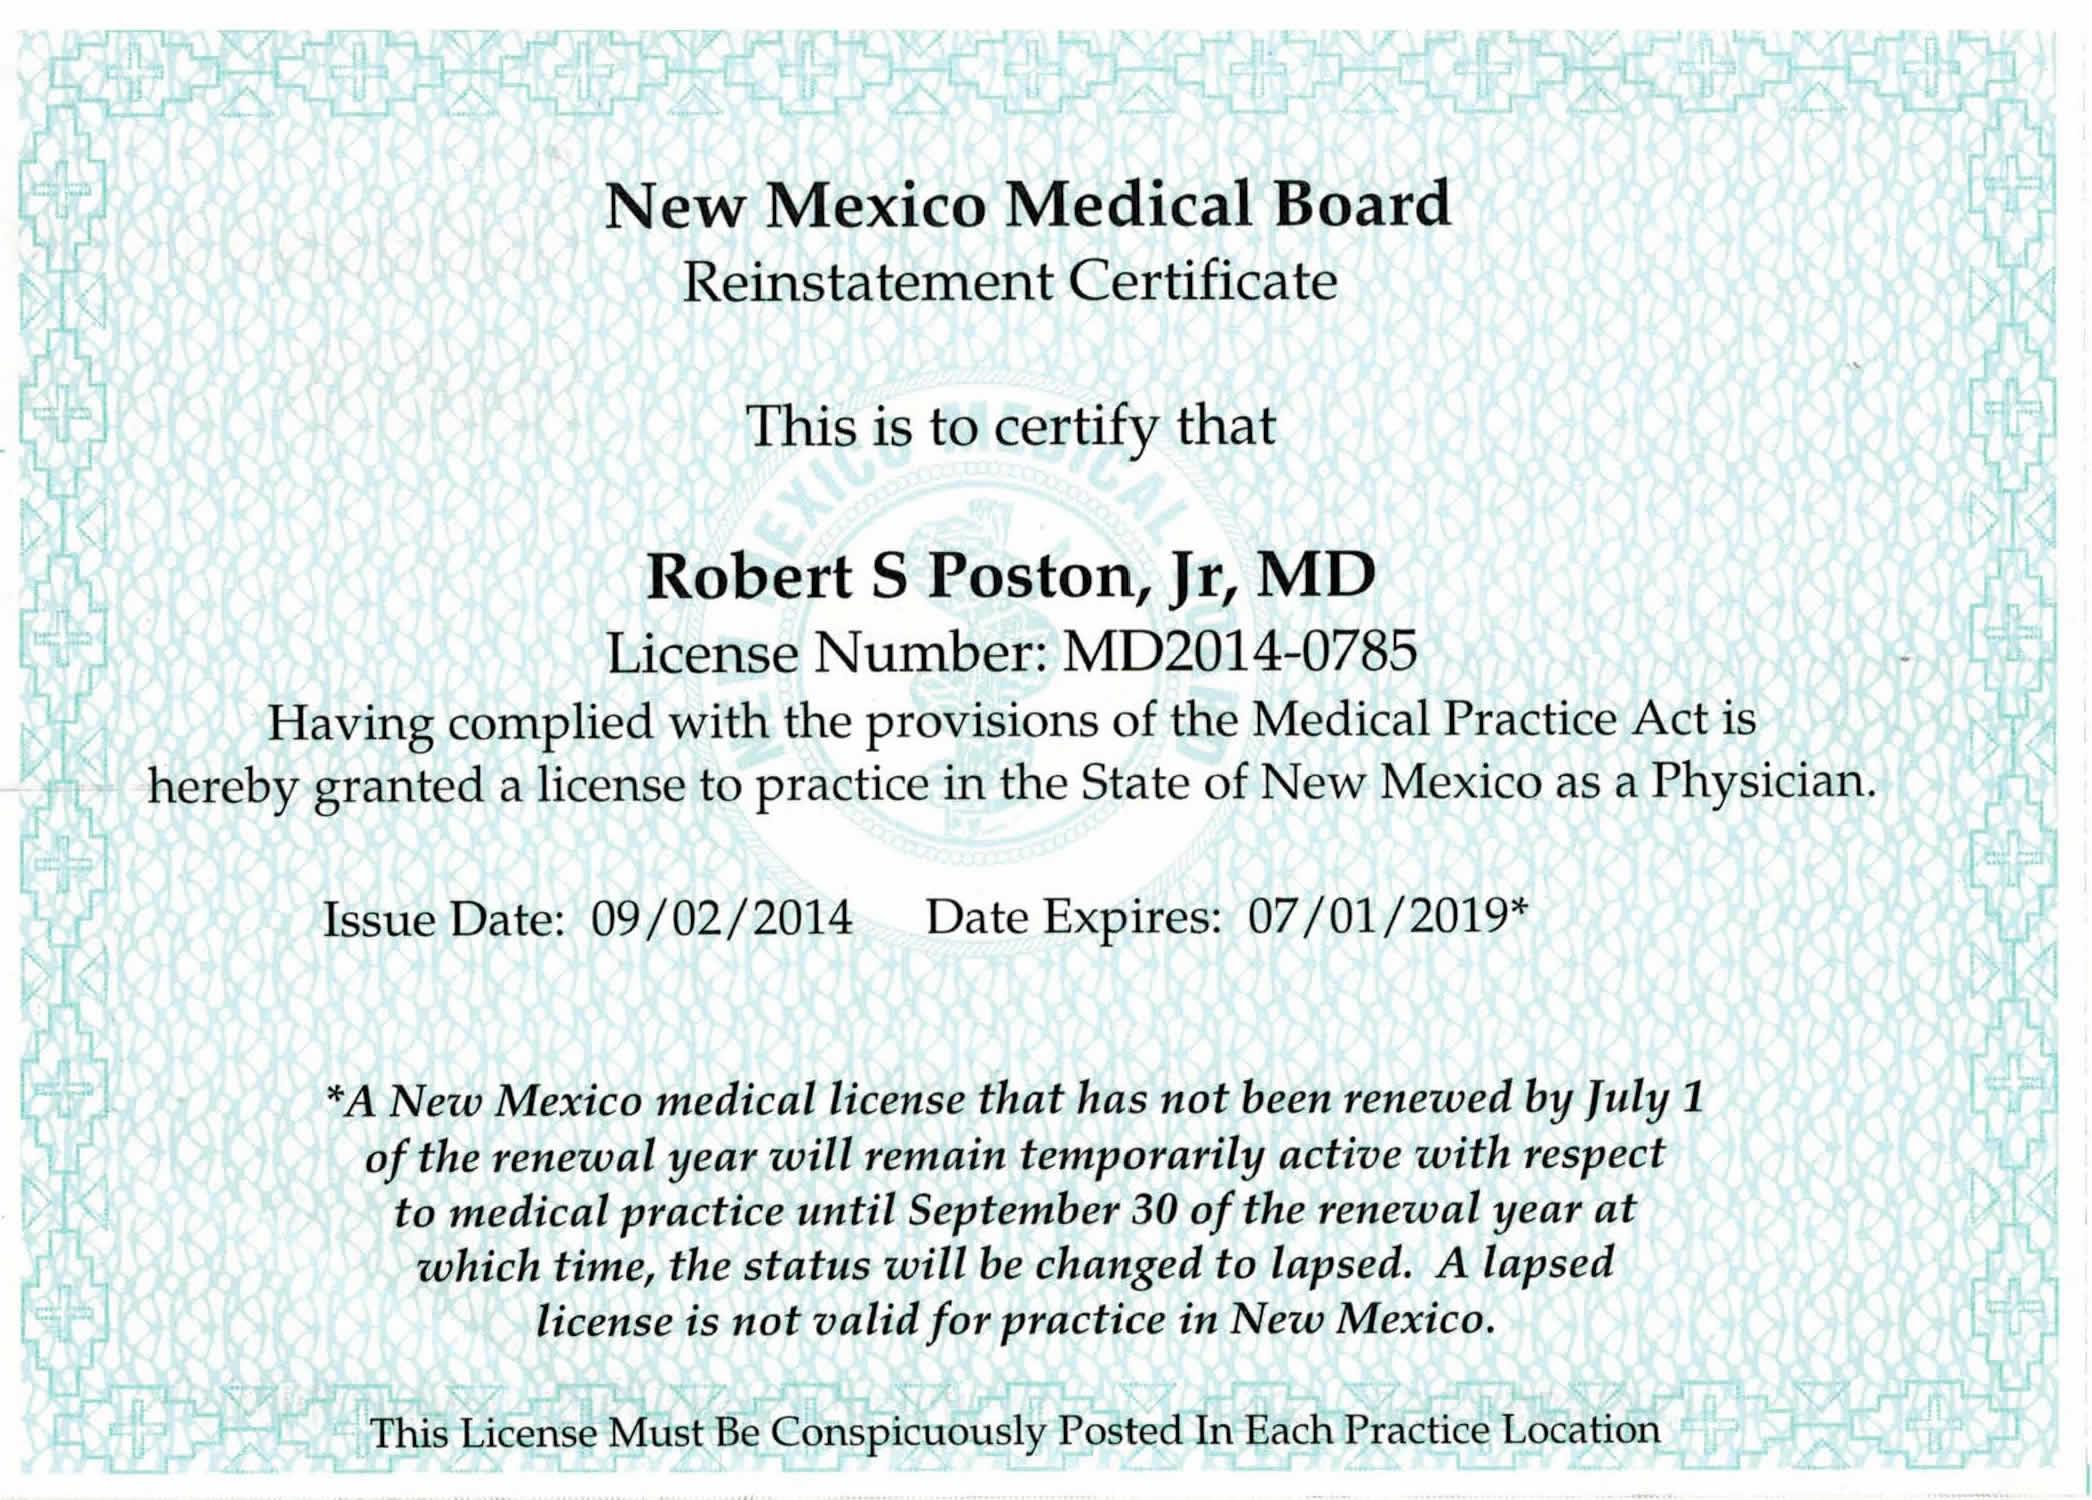 Electronic Curriculum Vitae – Robert S Poston, MD